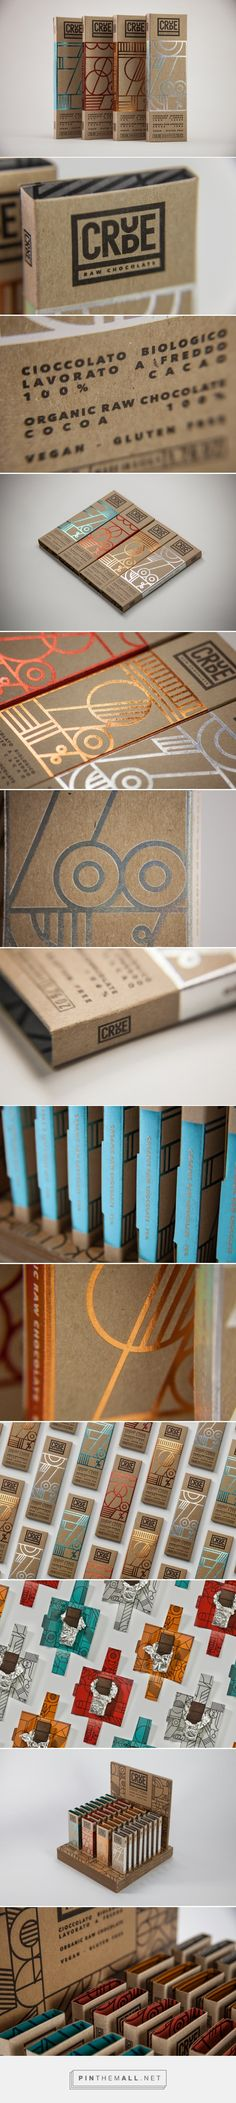 Crude - Raw Chocolate packaging design by Happycentro - http://www.packagingoftheworld.com/2016/12/crude-raw-chocolate.html